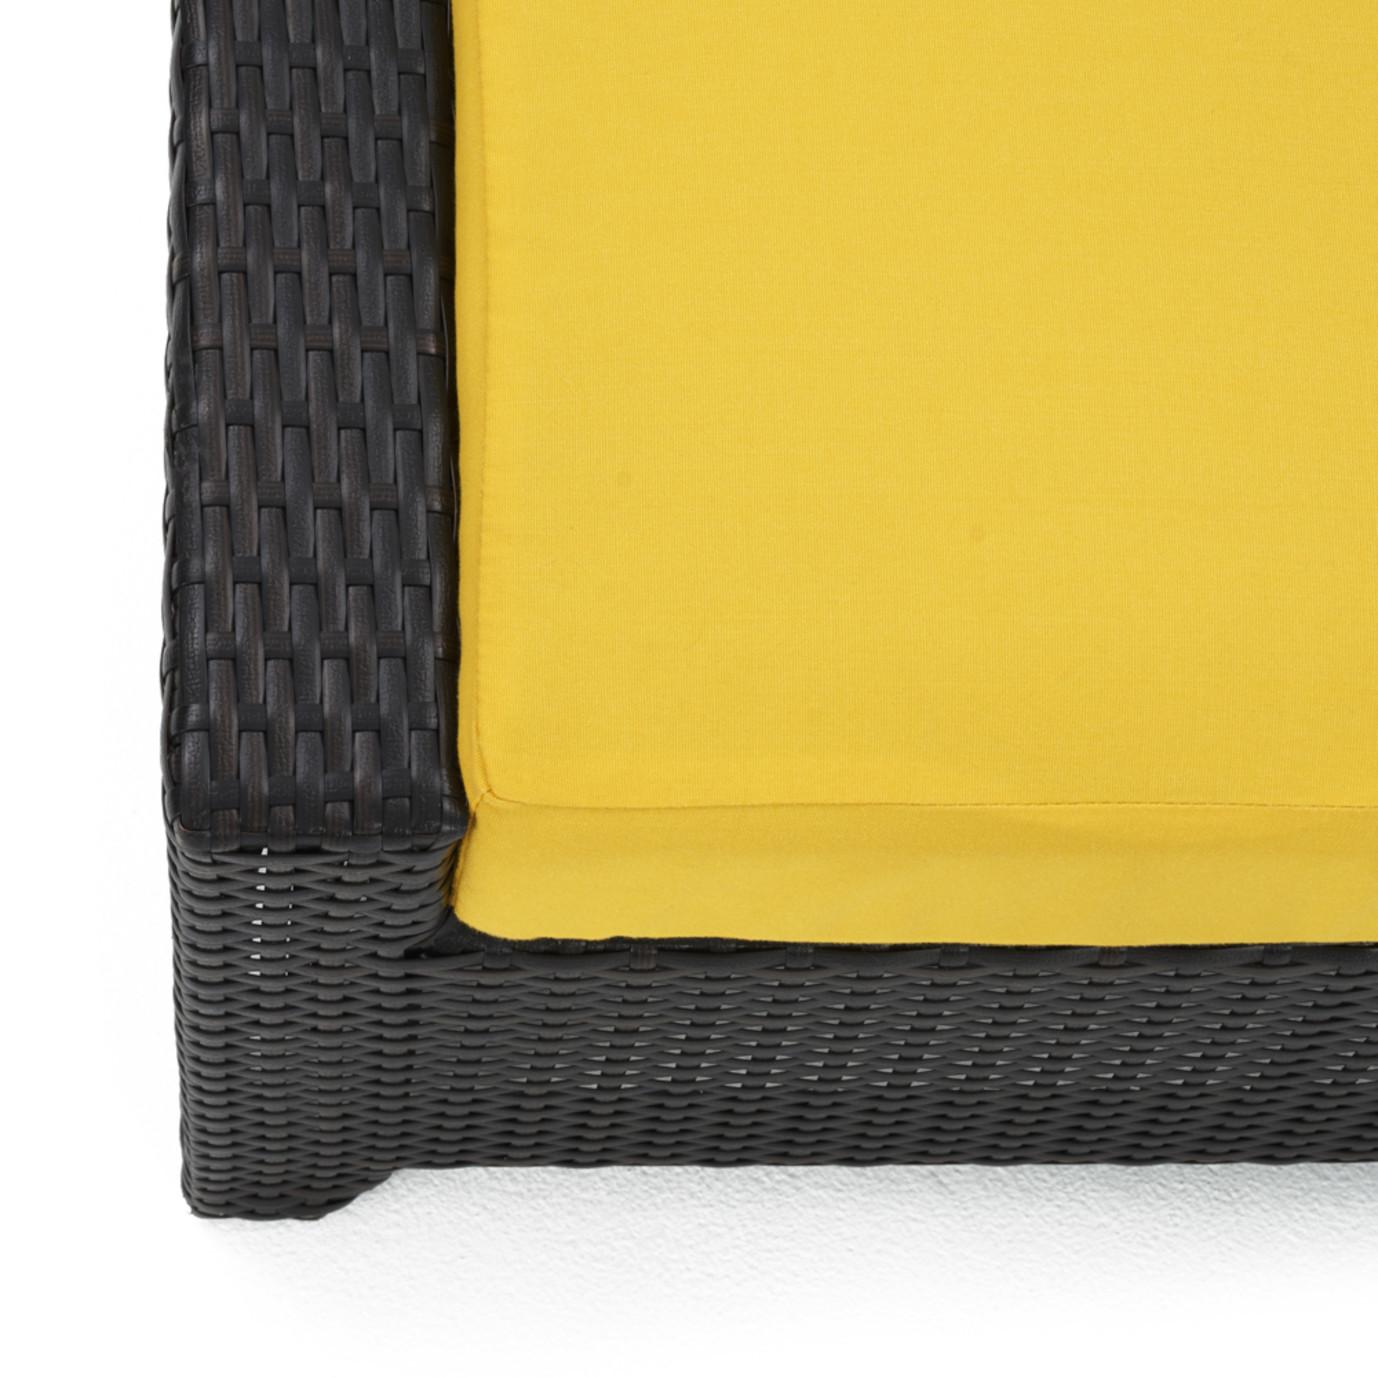 Deco™ 5pc Love & Club Seating Set - Sunflower Yellow